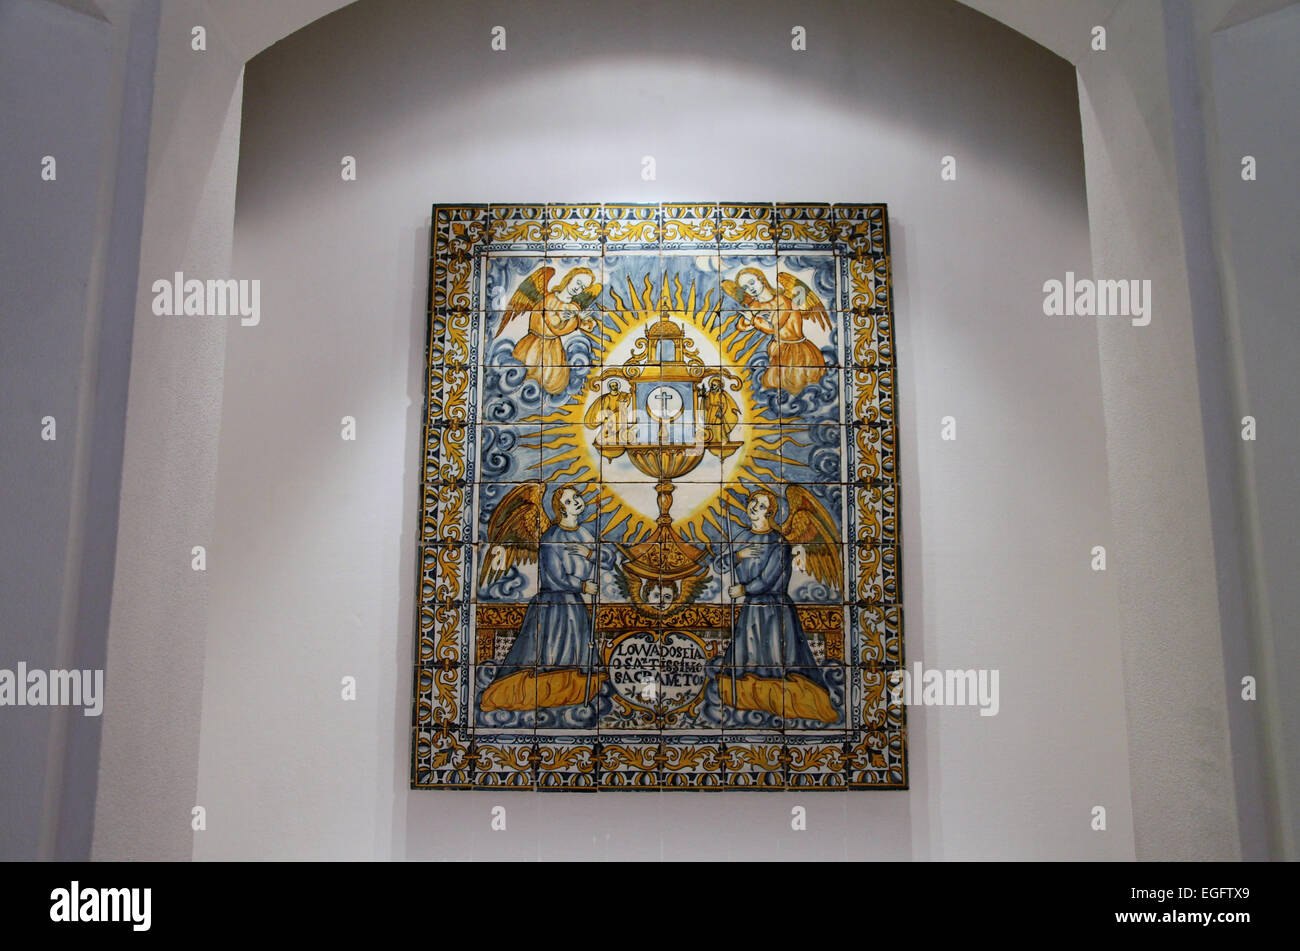 Hand painted azulejos stockfotos hand painted azulejos for Azulejos europa 9 telefono